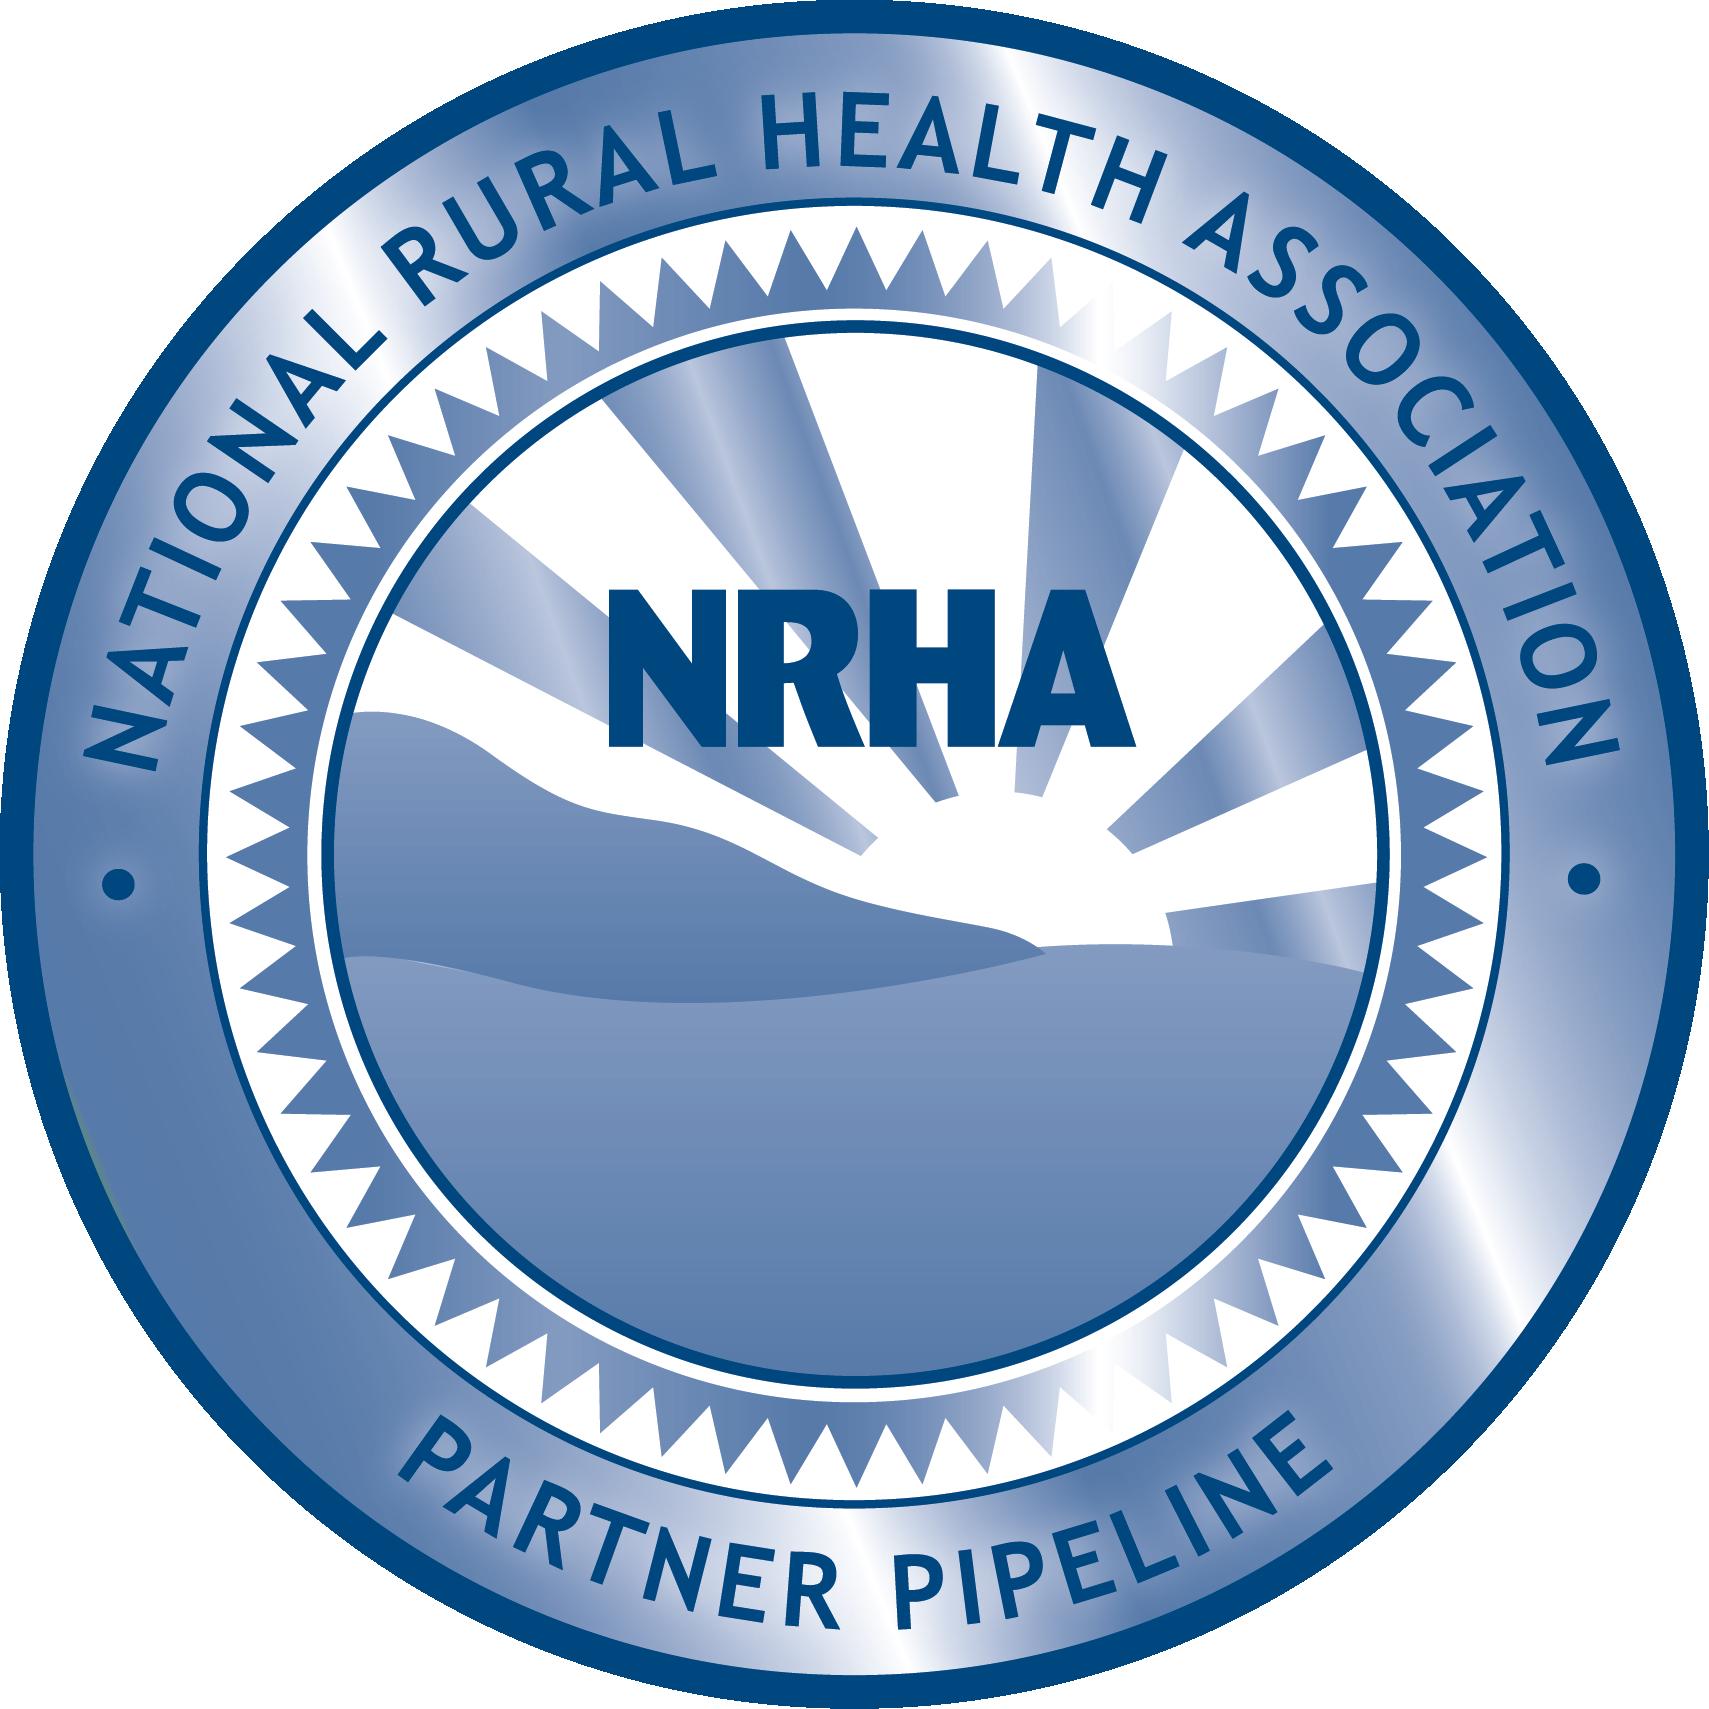 NRHA Partner Pipeline Seal